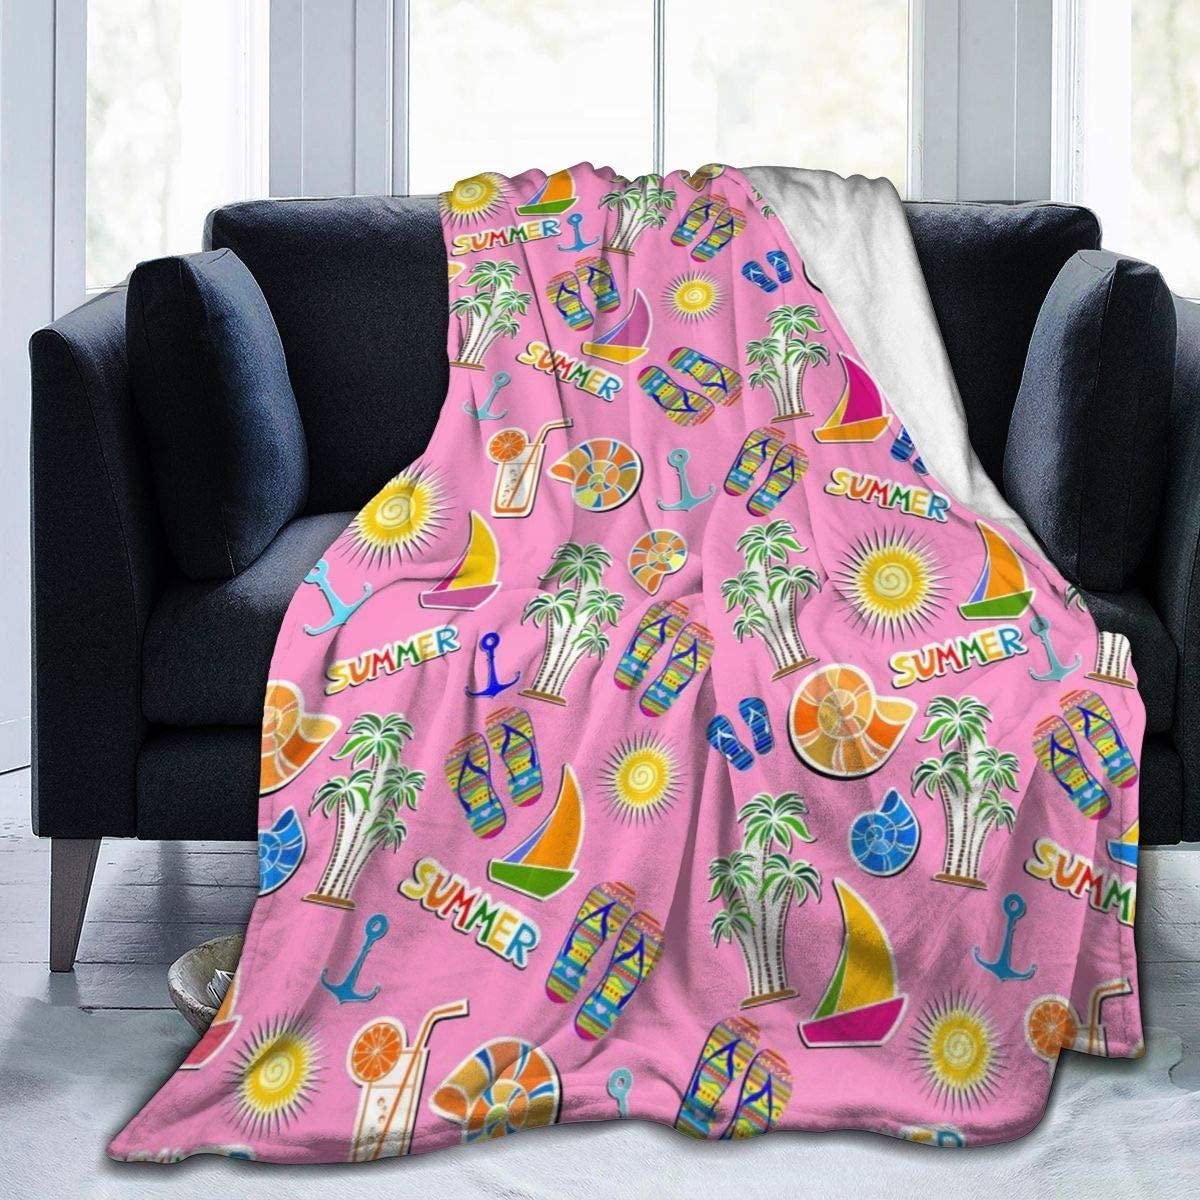 Micro Fleece Plush Soft Baby Blanket Pink Summer Beach Palm Tree Fluffy Warm Toddler Bed/Crib Blanket Lightweight Flannel Daycare Nap Kids Sleeping Tummy Time Throw Blanket Girls Boy Kid/Baby